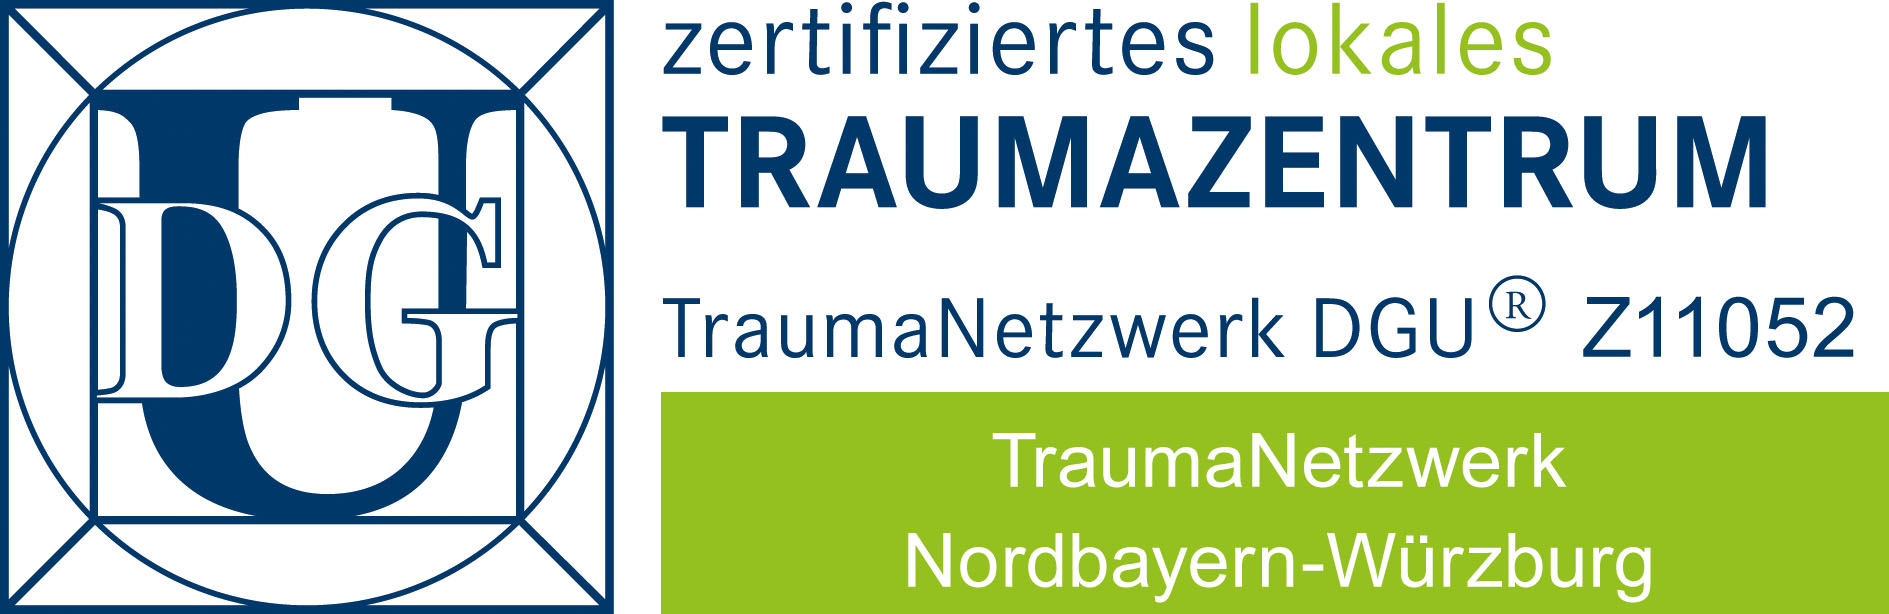 http://www.khtbb.de/media-khtbb/img/Logos/Krankenhaus-Tauberbischofsheim.jpg